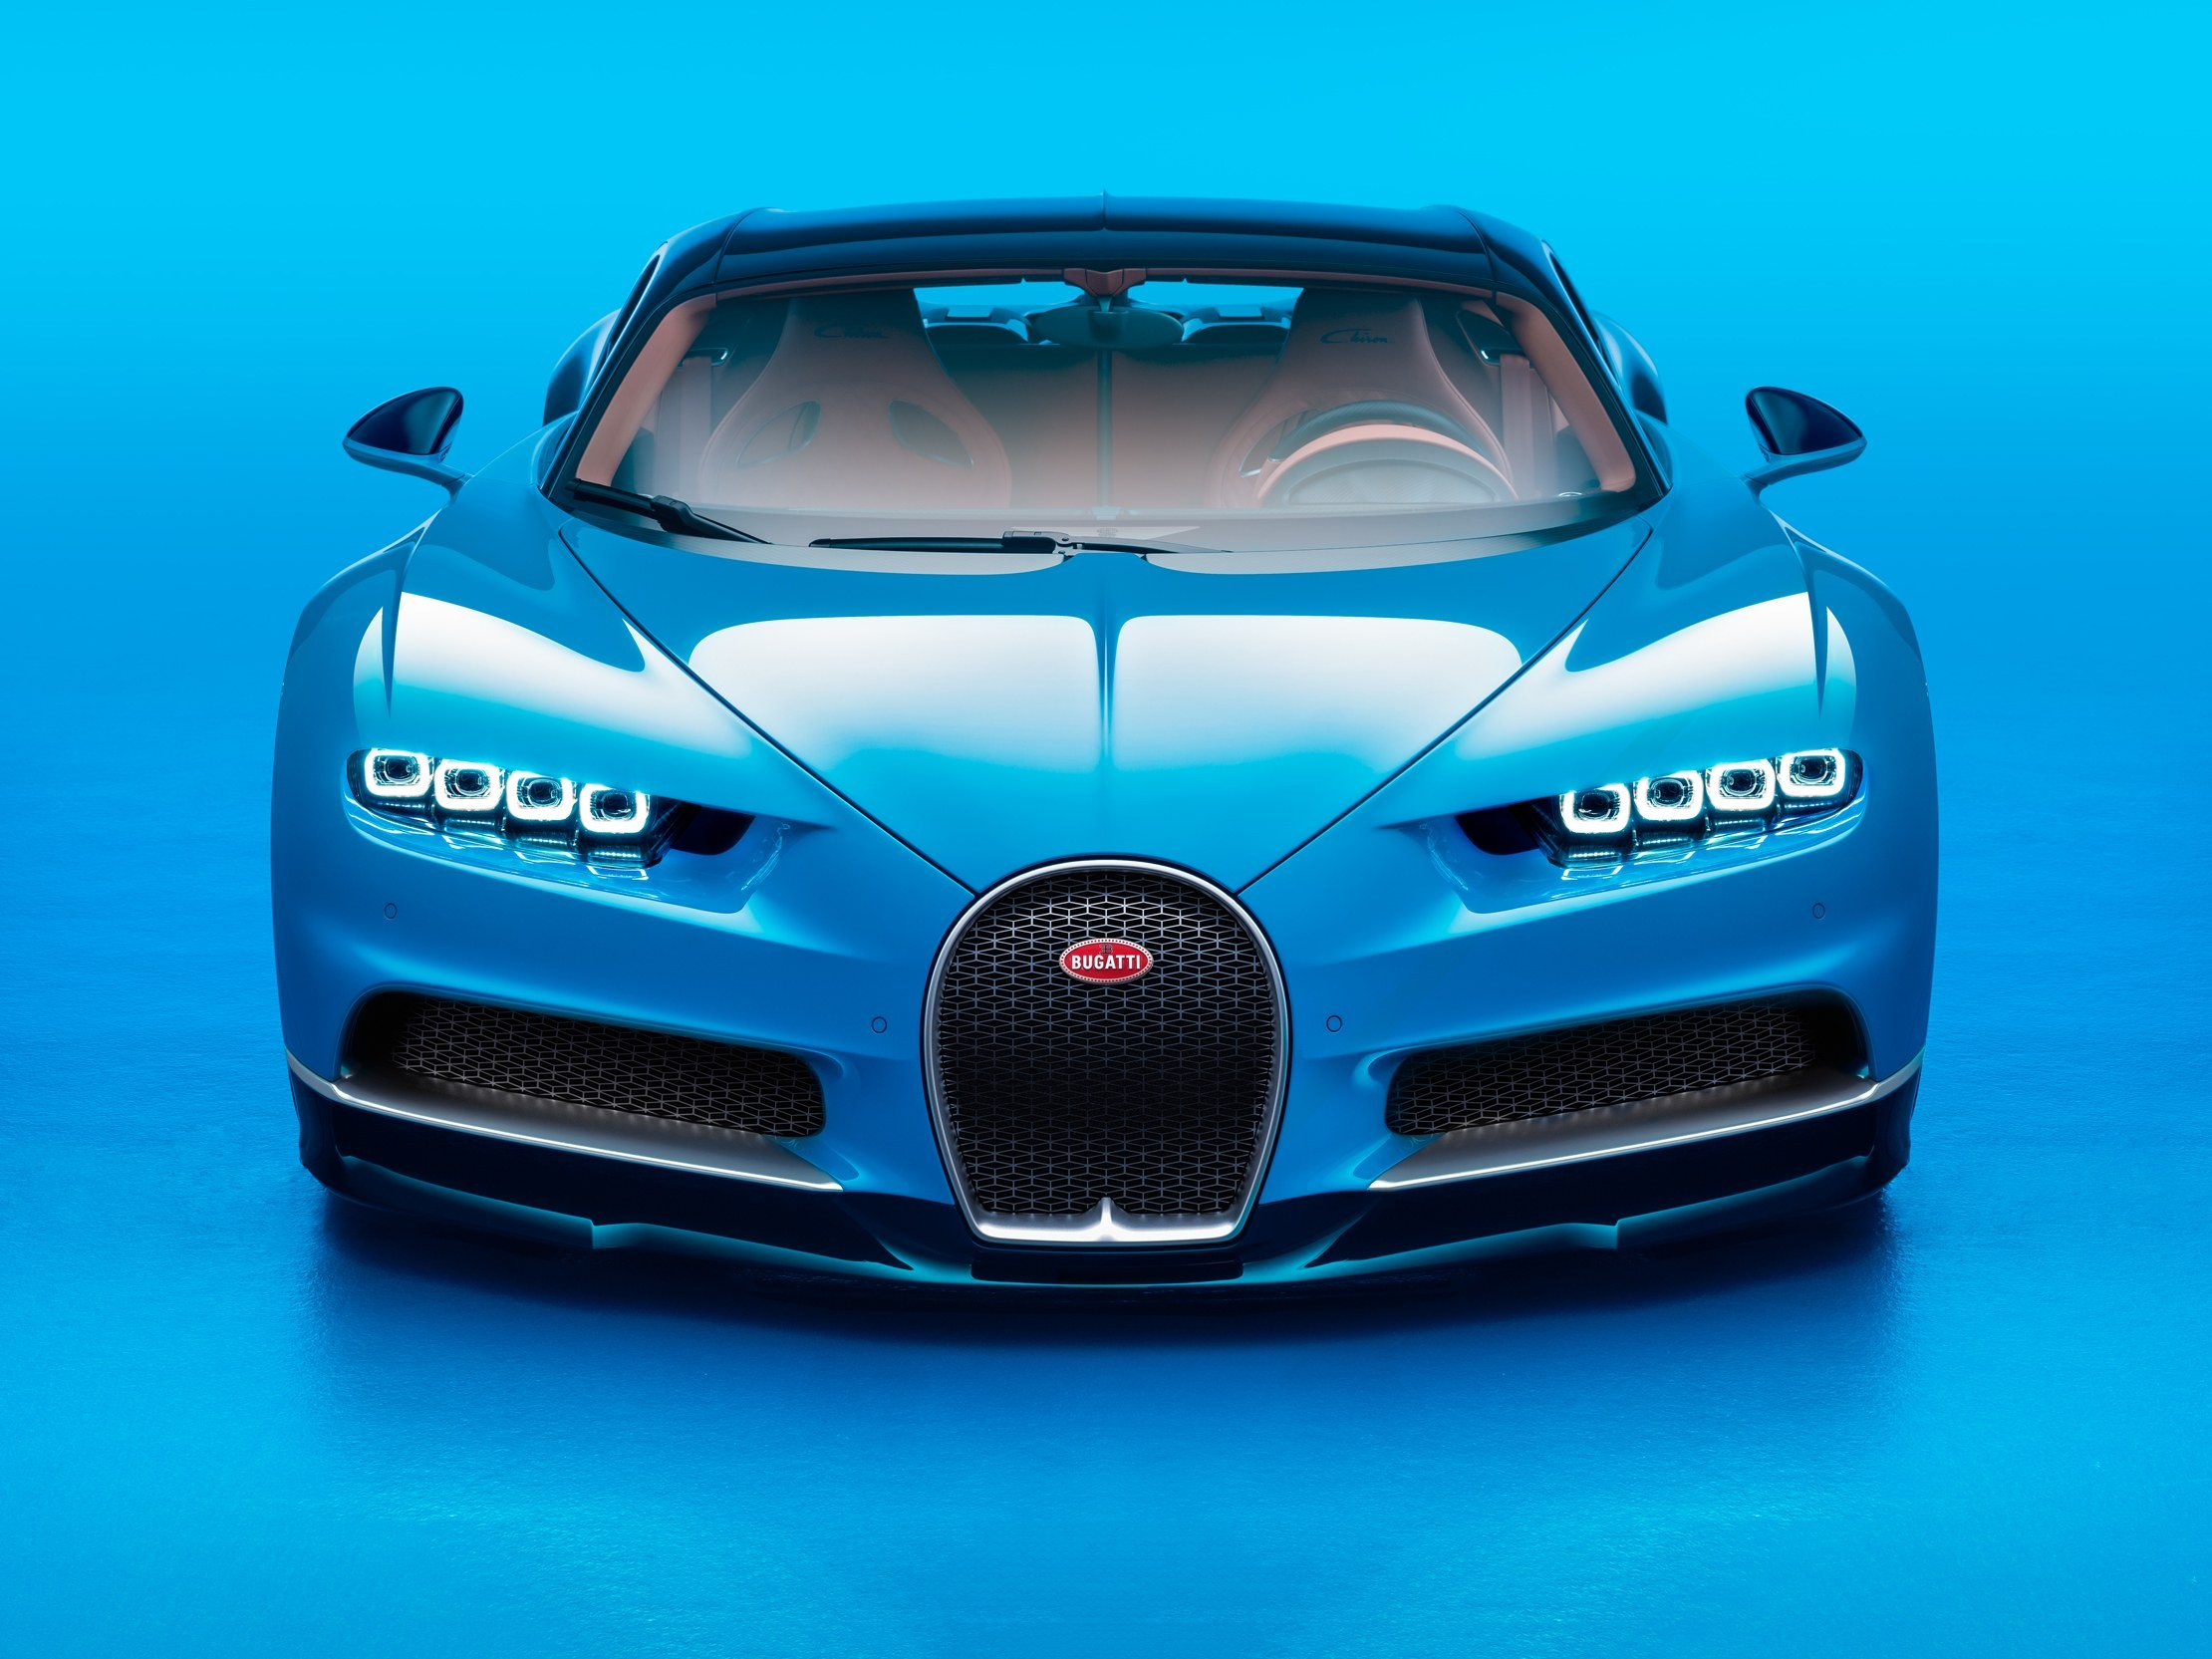 Bugatti W16 Engine Diagram How Bugatti Crafted the Chiron the World S Last Truly Great Car Of Bugatti W16 Engine Diagram